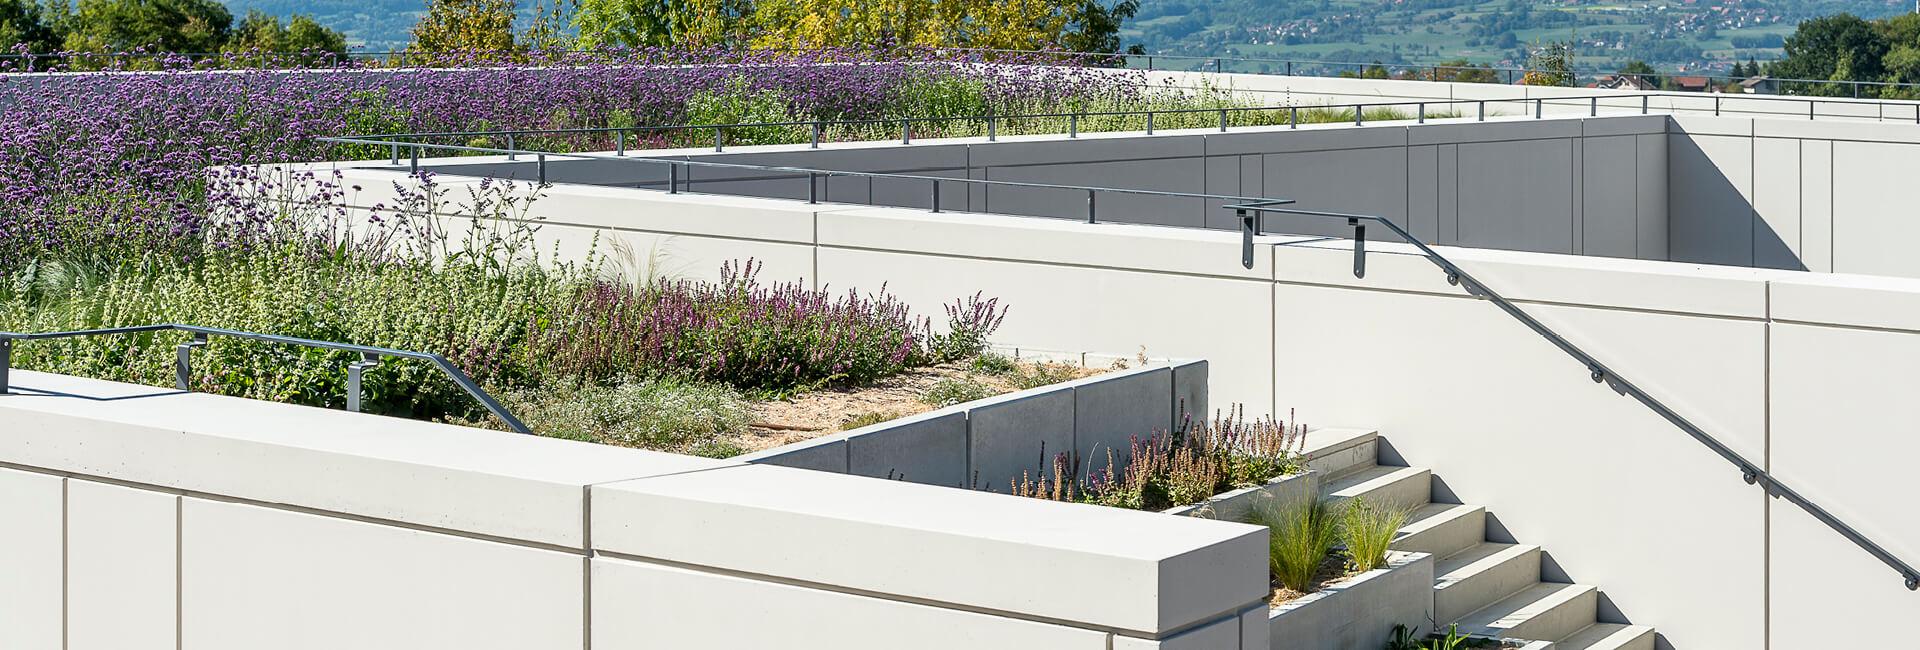 Un toit-terrasse mi-jardin, mi-céramique | SOPREMA Entreprises